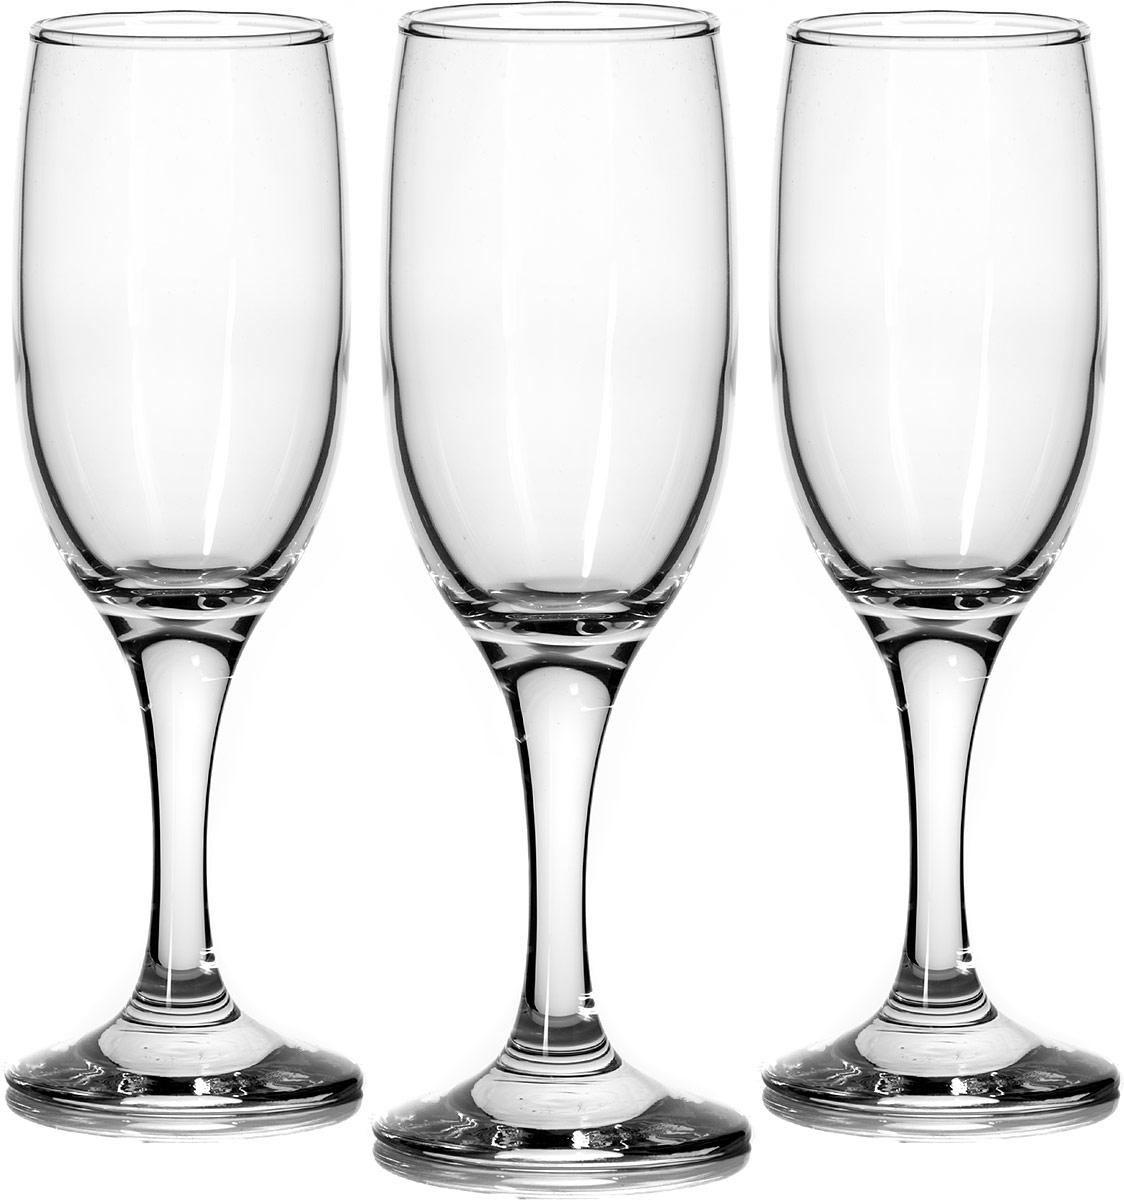 Набор бокалов Pasabahce Бистро, 190 мл, 6 шт набор бокалов pasabahce isabella 65 мл 6 шт